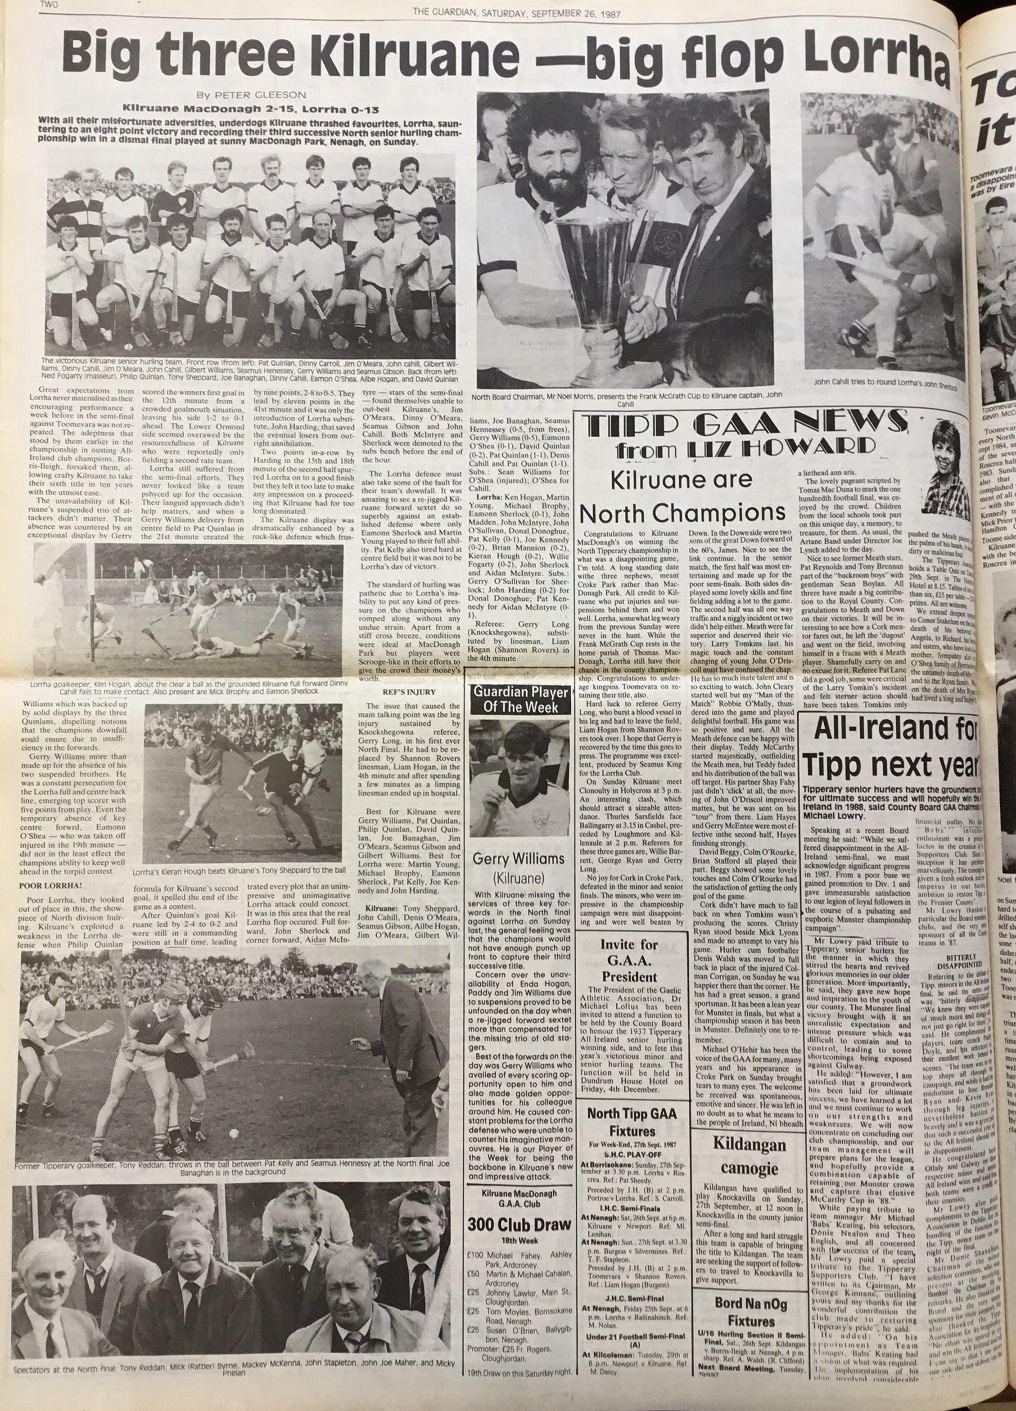 1987 North hurling final